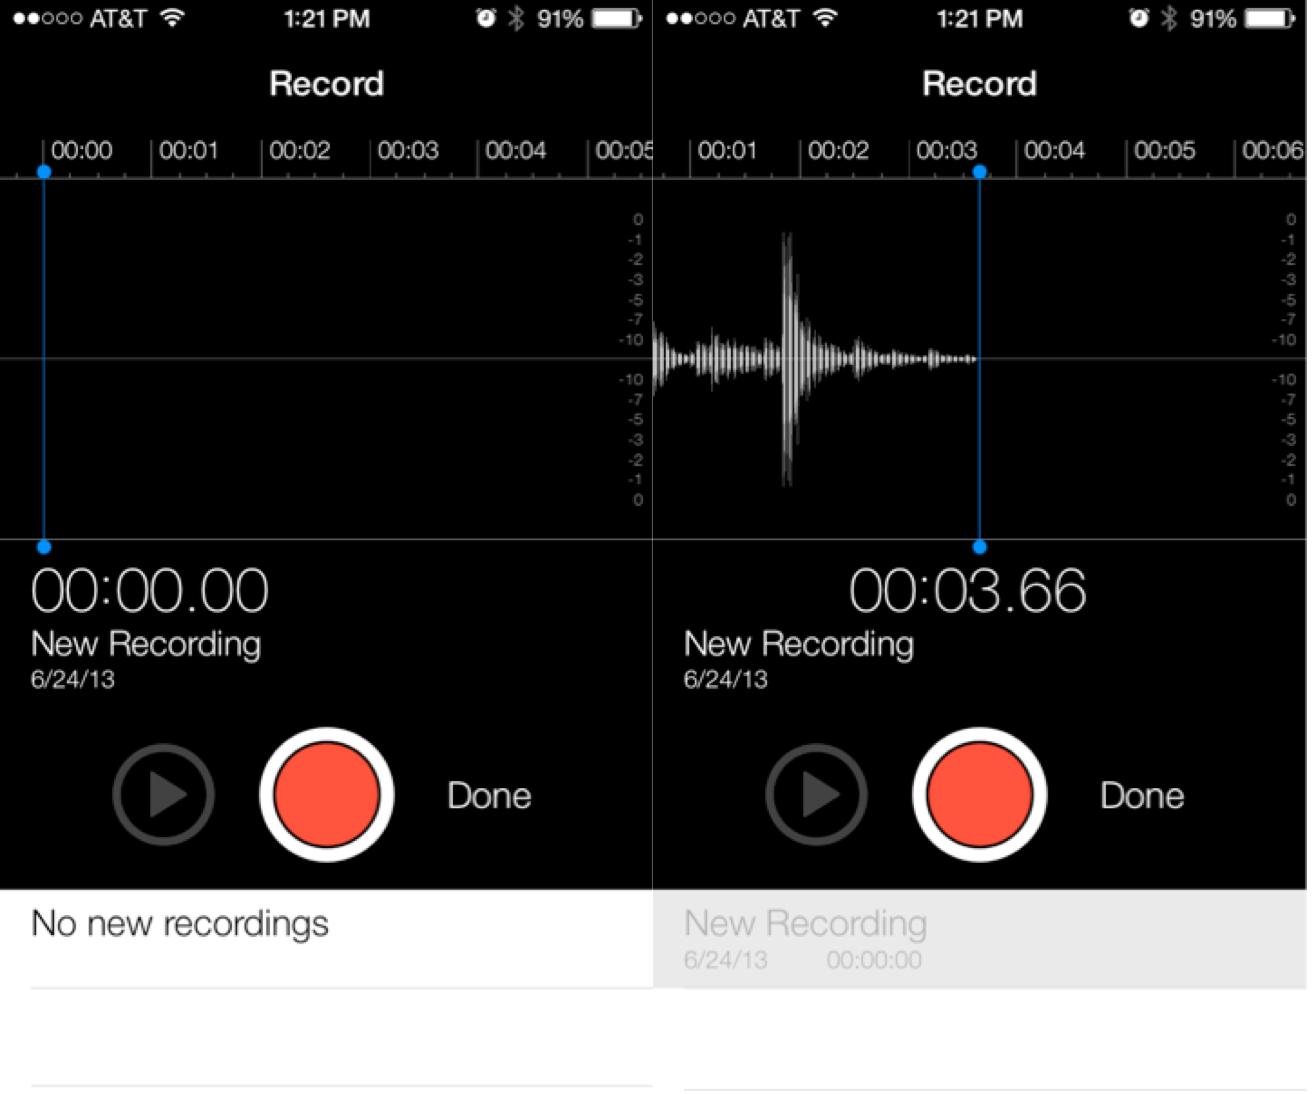 Apple seeds iOS 7 beta 2 to developers: Voice Memos, new